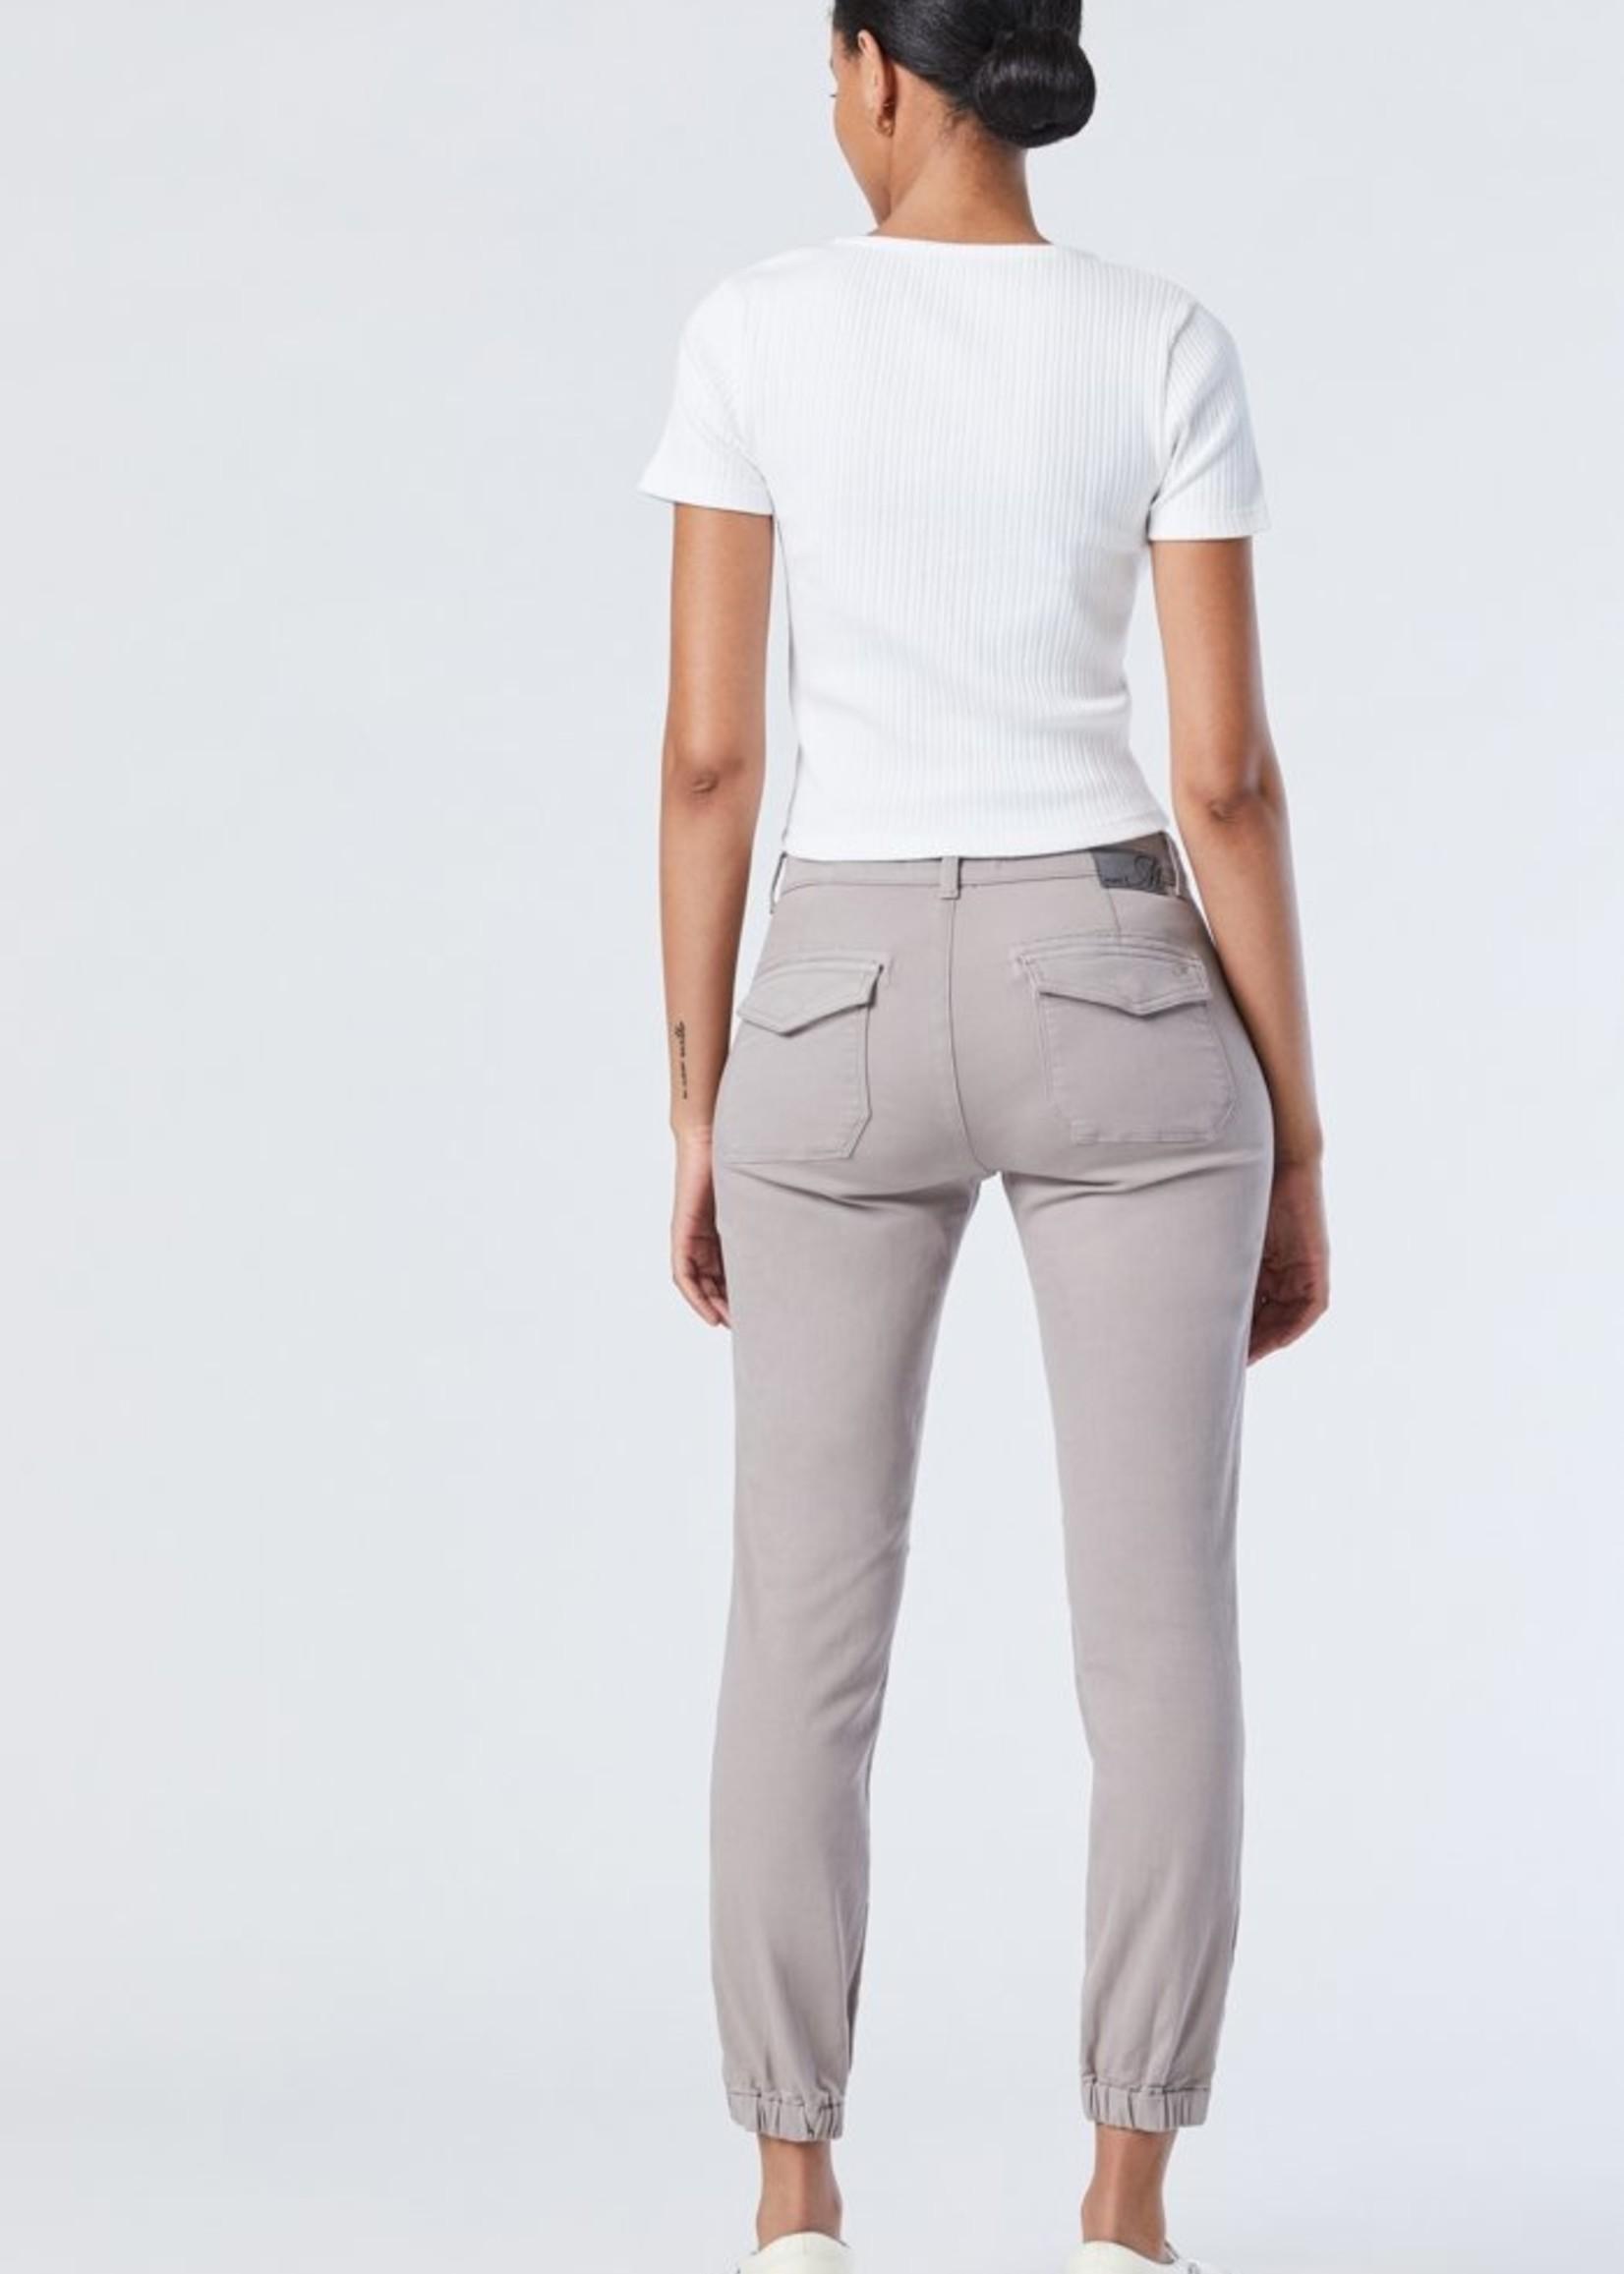 MAVI Jeans Ivy Cargo Slim